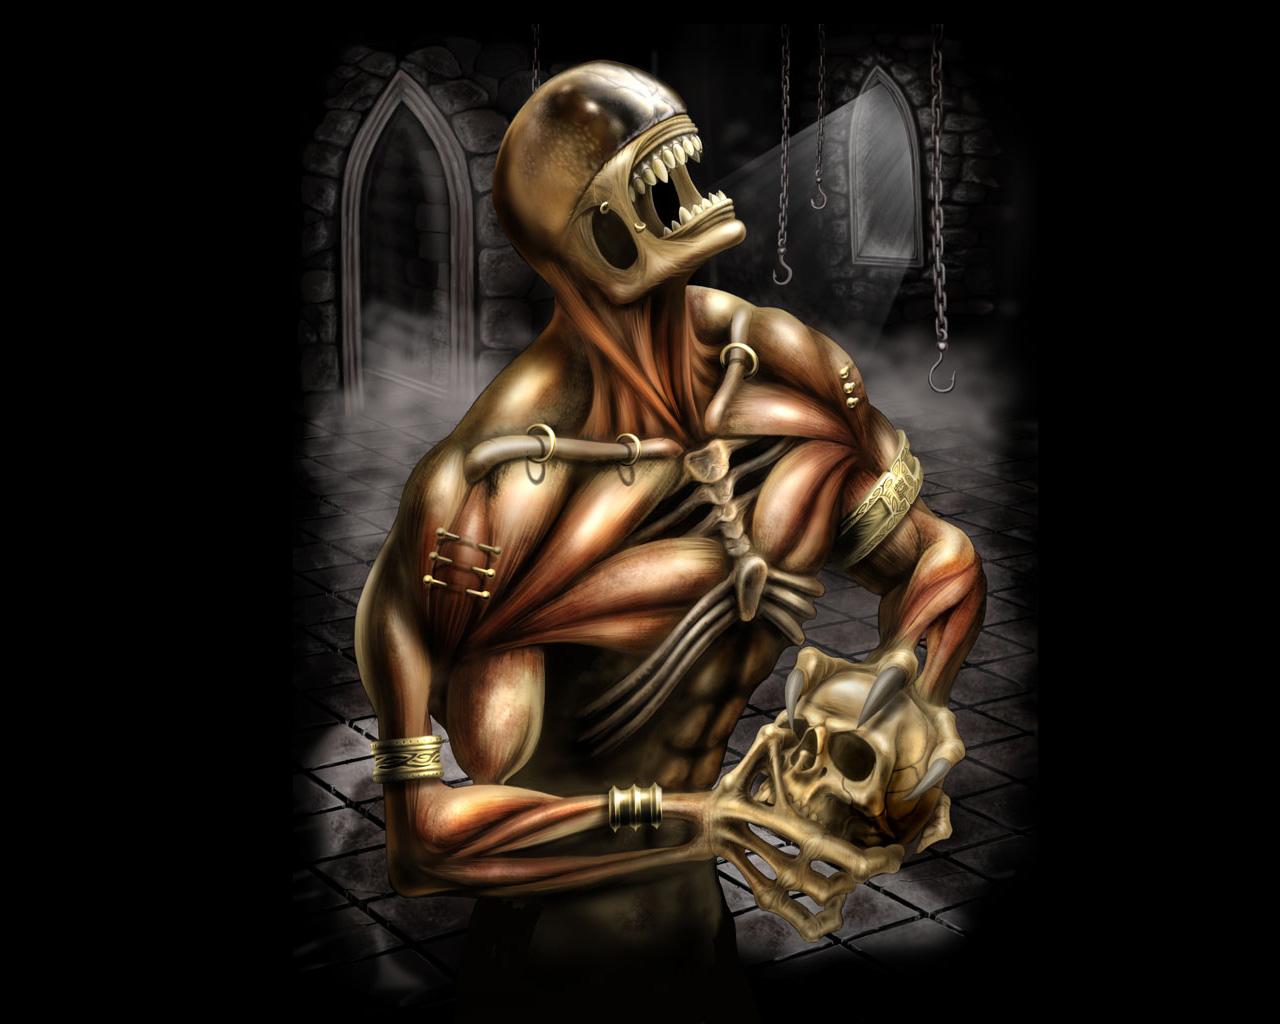 Skull wallpapers skeleton wallpapers 3dwallpapers cini - Skeleton wallpaper ...